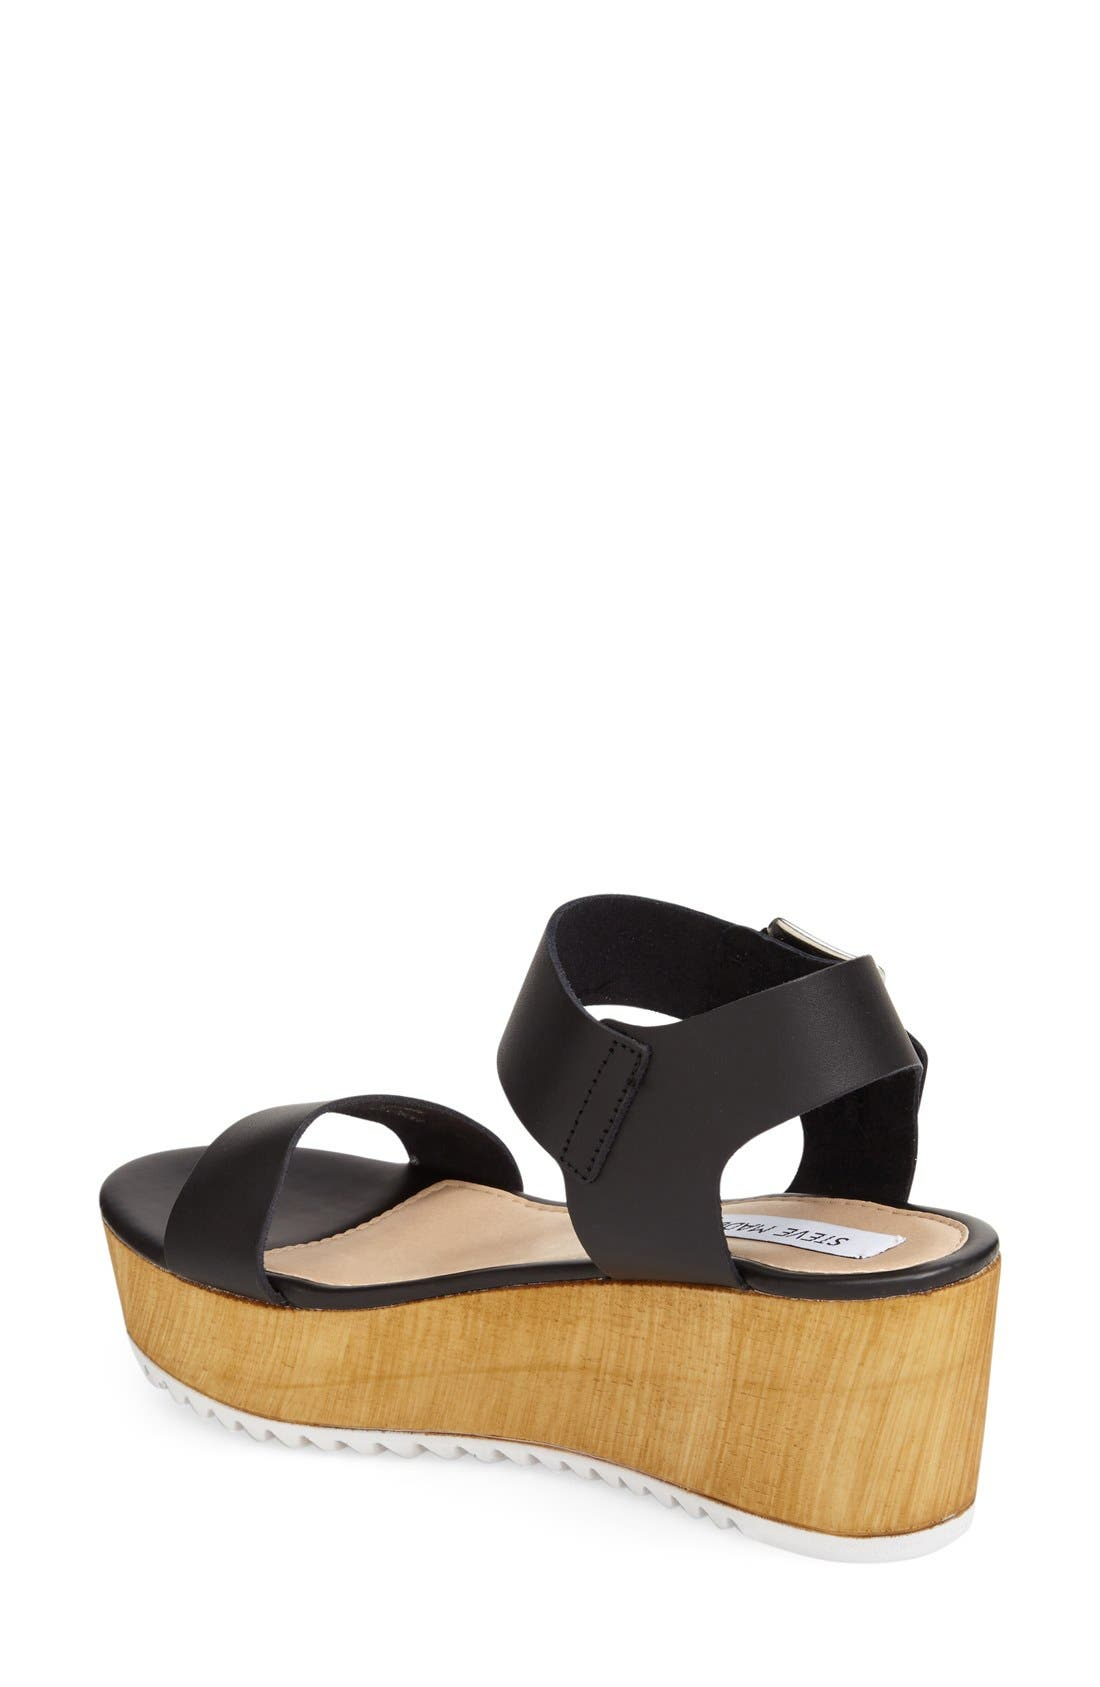 'Nylee' Platform Sandal,                             Alternate thumbnail 4, color,                             001